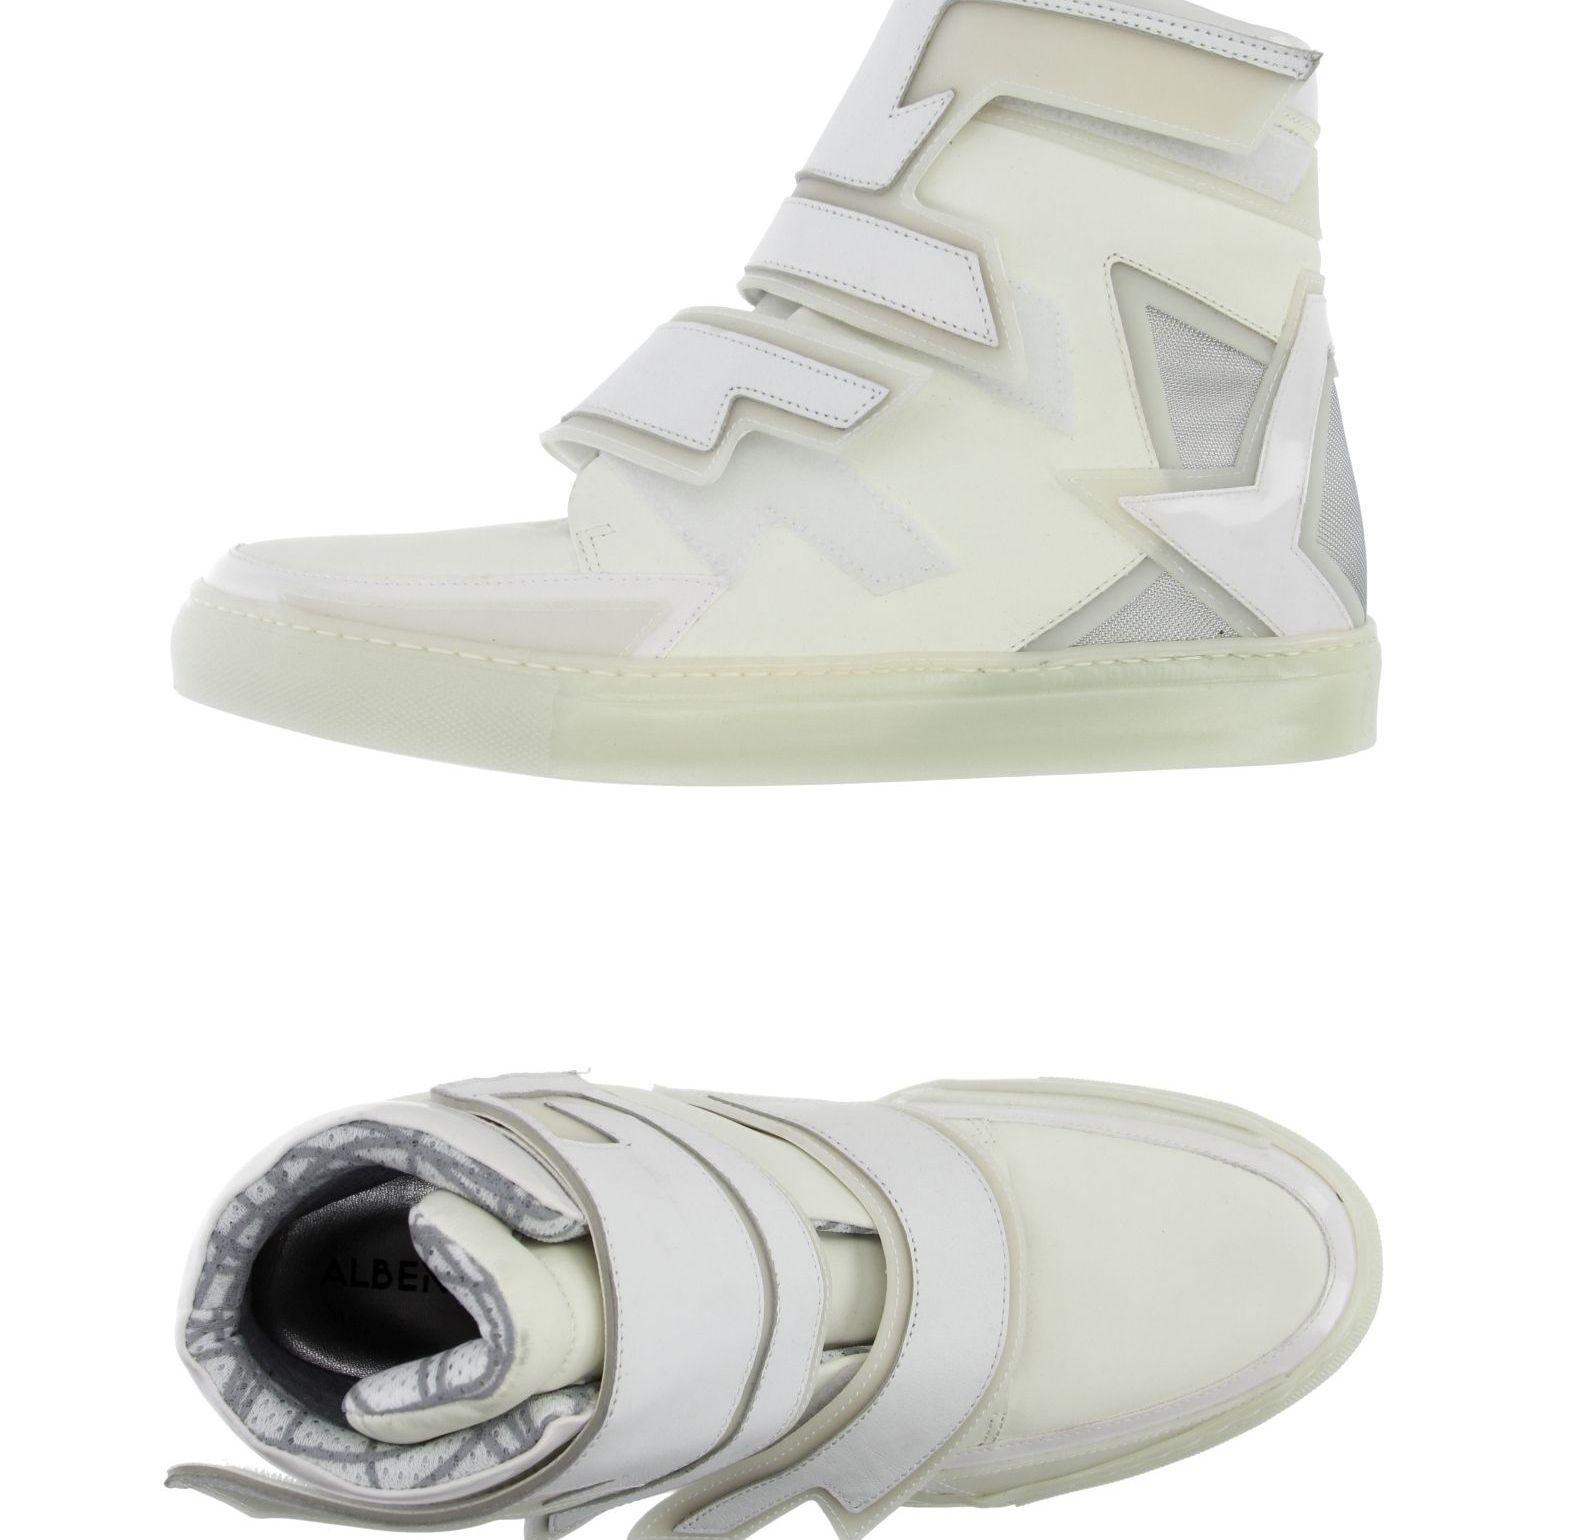 ALBERTO PREMI ΠΑΠΟΥΤΣΙΑ Χαμηλά sneakers  joy  style  fashion  ef9738898f8